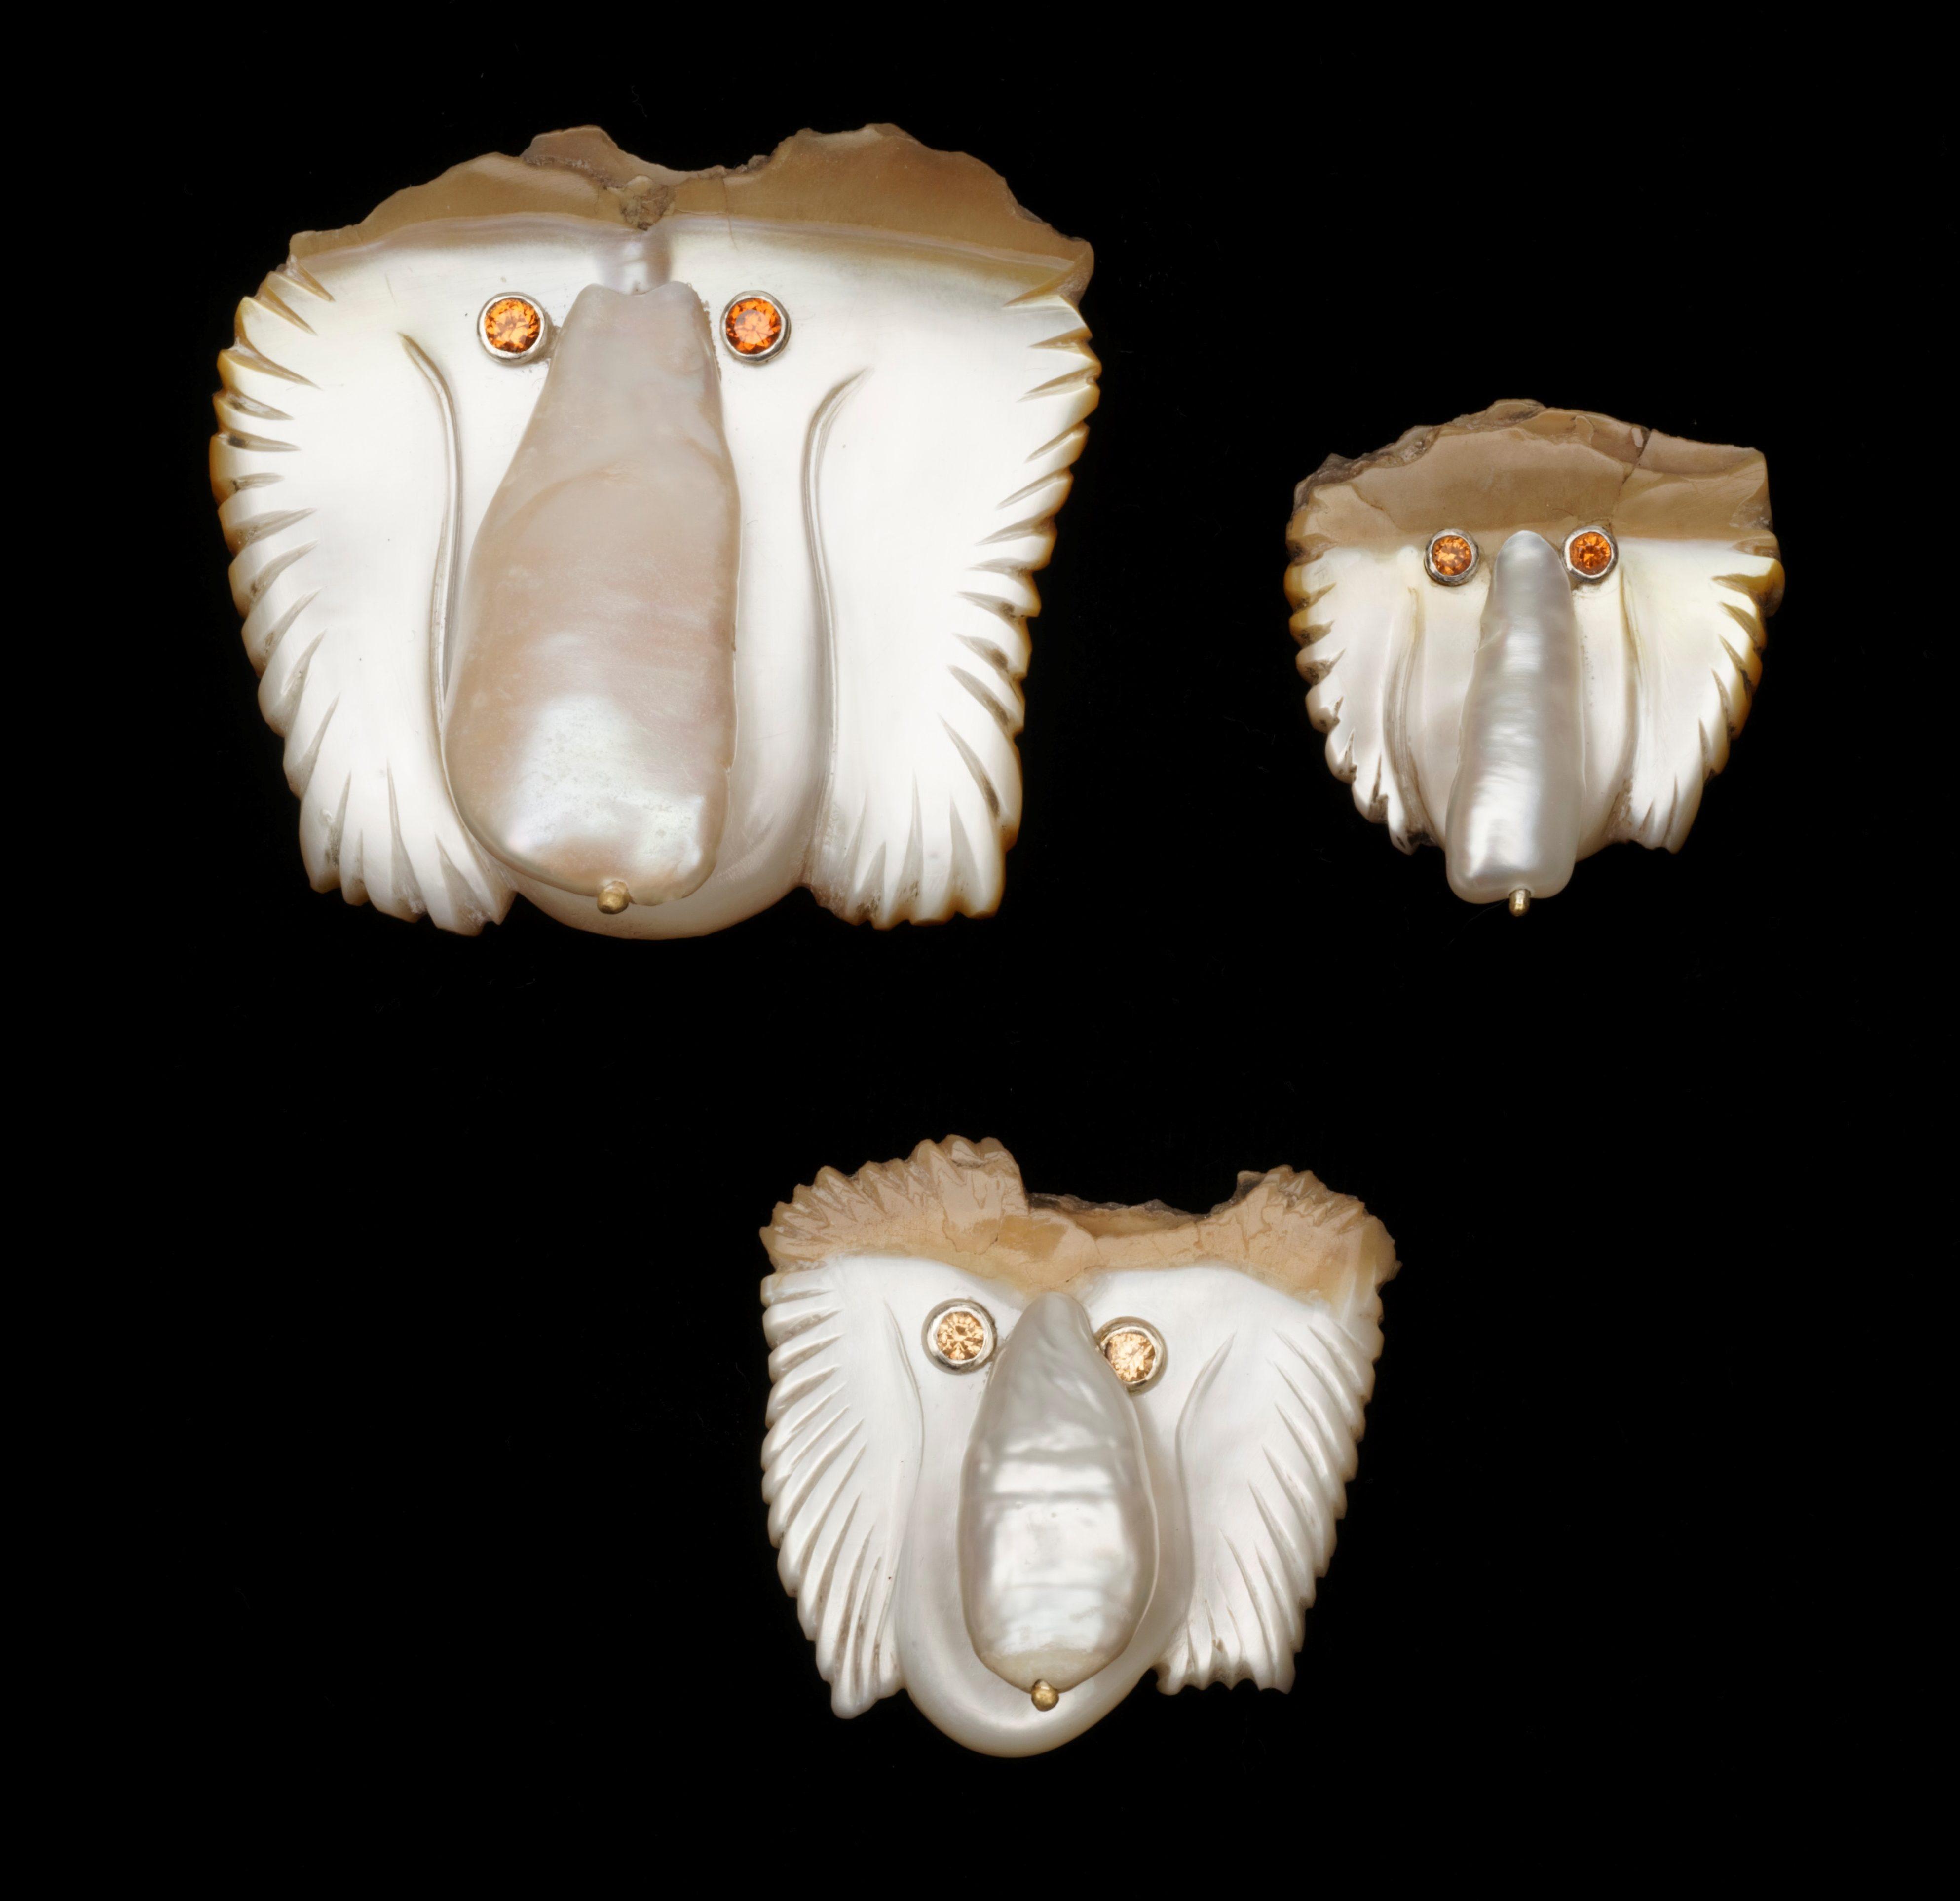 Jane Dodd, Proboscis Problems, broches, 2019. Foto Haru Sameshima, parelmoer, schelp, parels, zilver, granaten